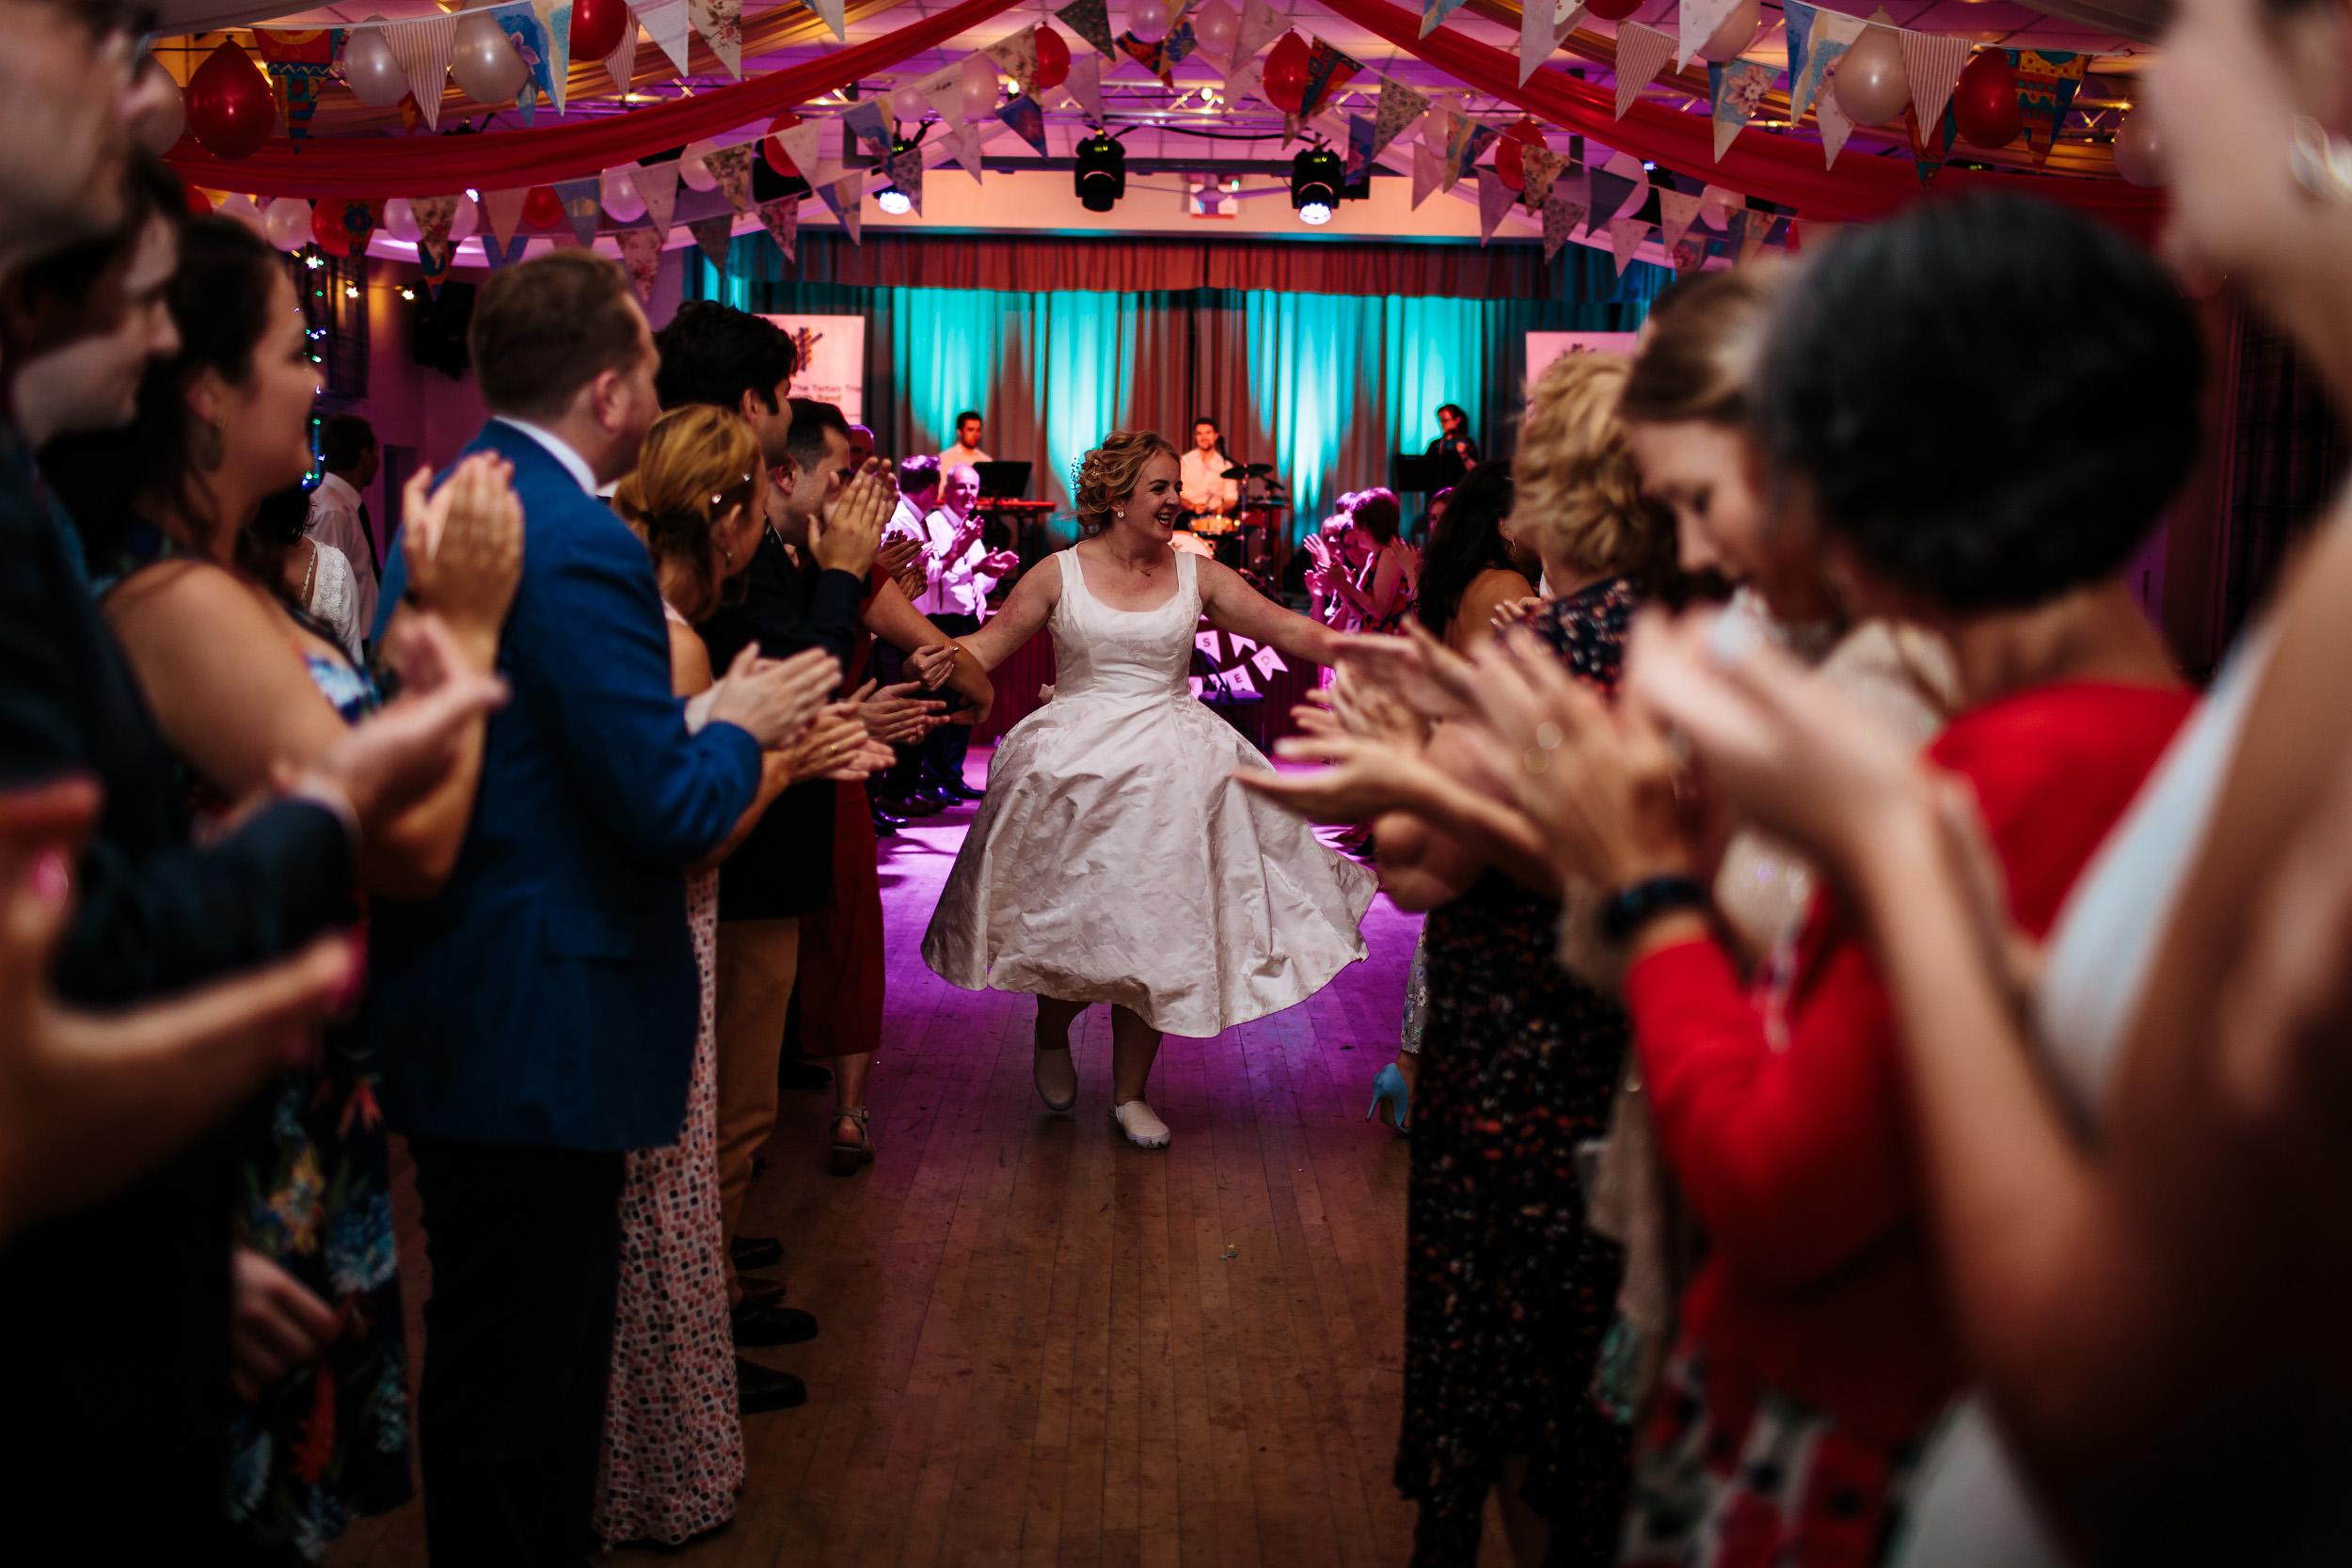 Bride ceilidh dancing at her wedding in Lancashire